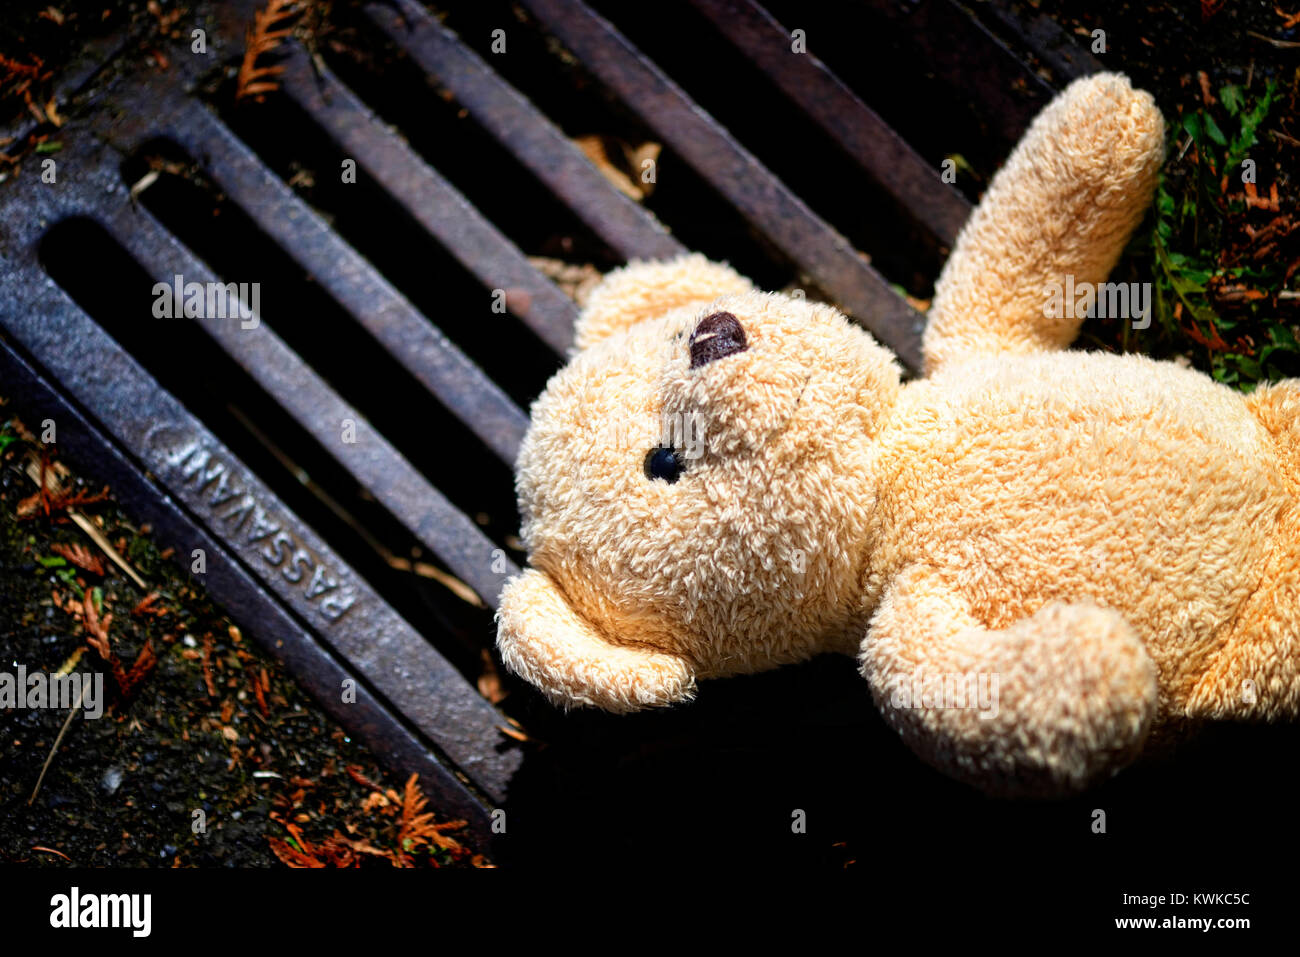 Material Teddy lies on the ground, symbolic photo childhood trauma and power, Ein Stoff-Teddy liegt auf dem Boden, Stock Photo